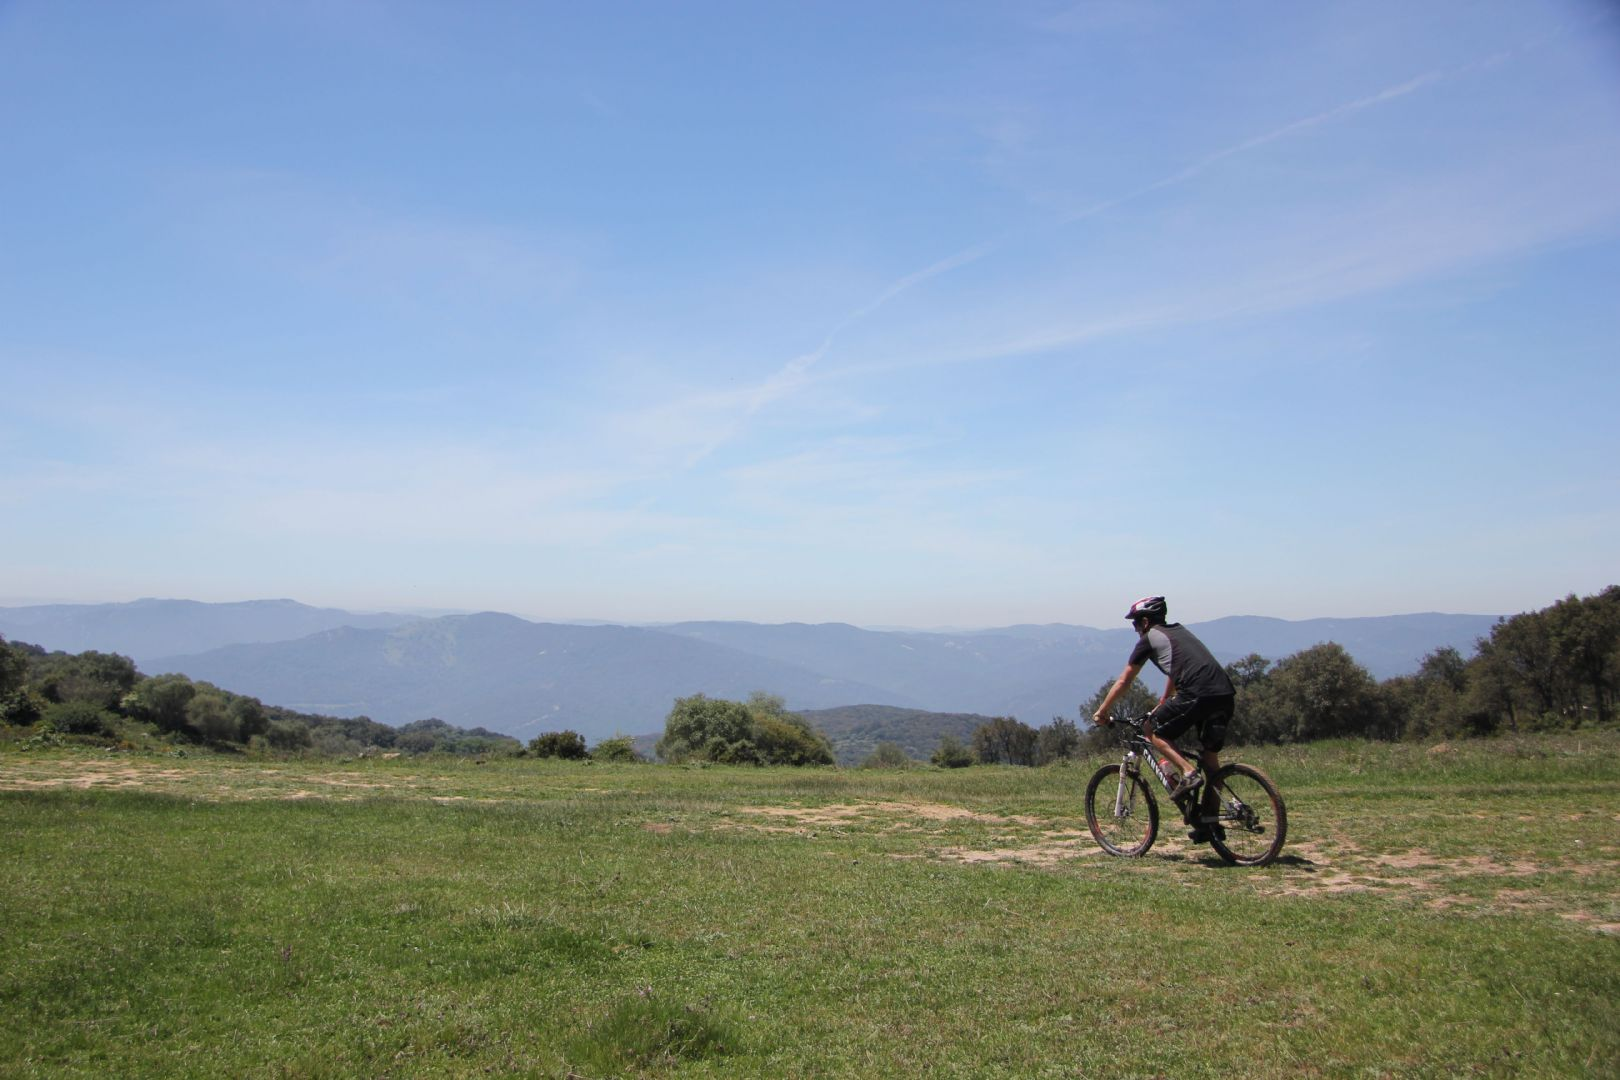 IMG_9241.JPG - Spain - Trans Andaluz - Guided Mountain Bike Holiday - Mountain Biking